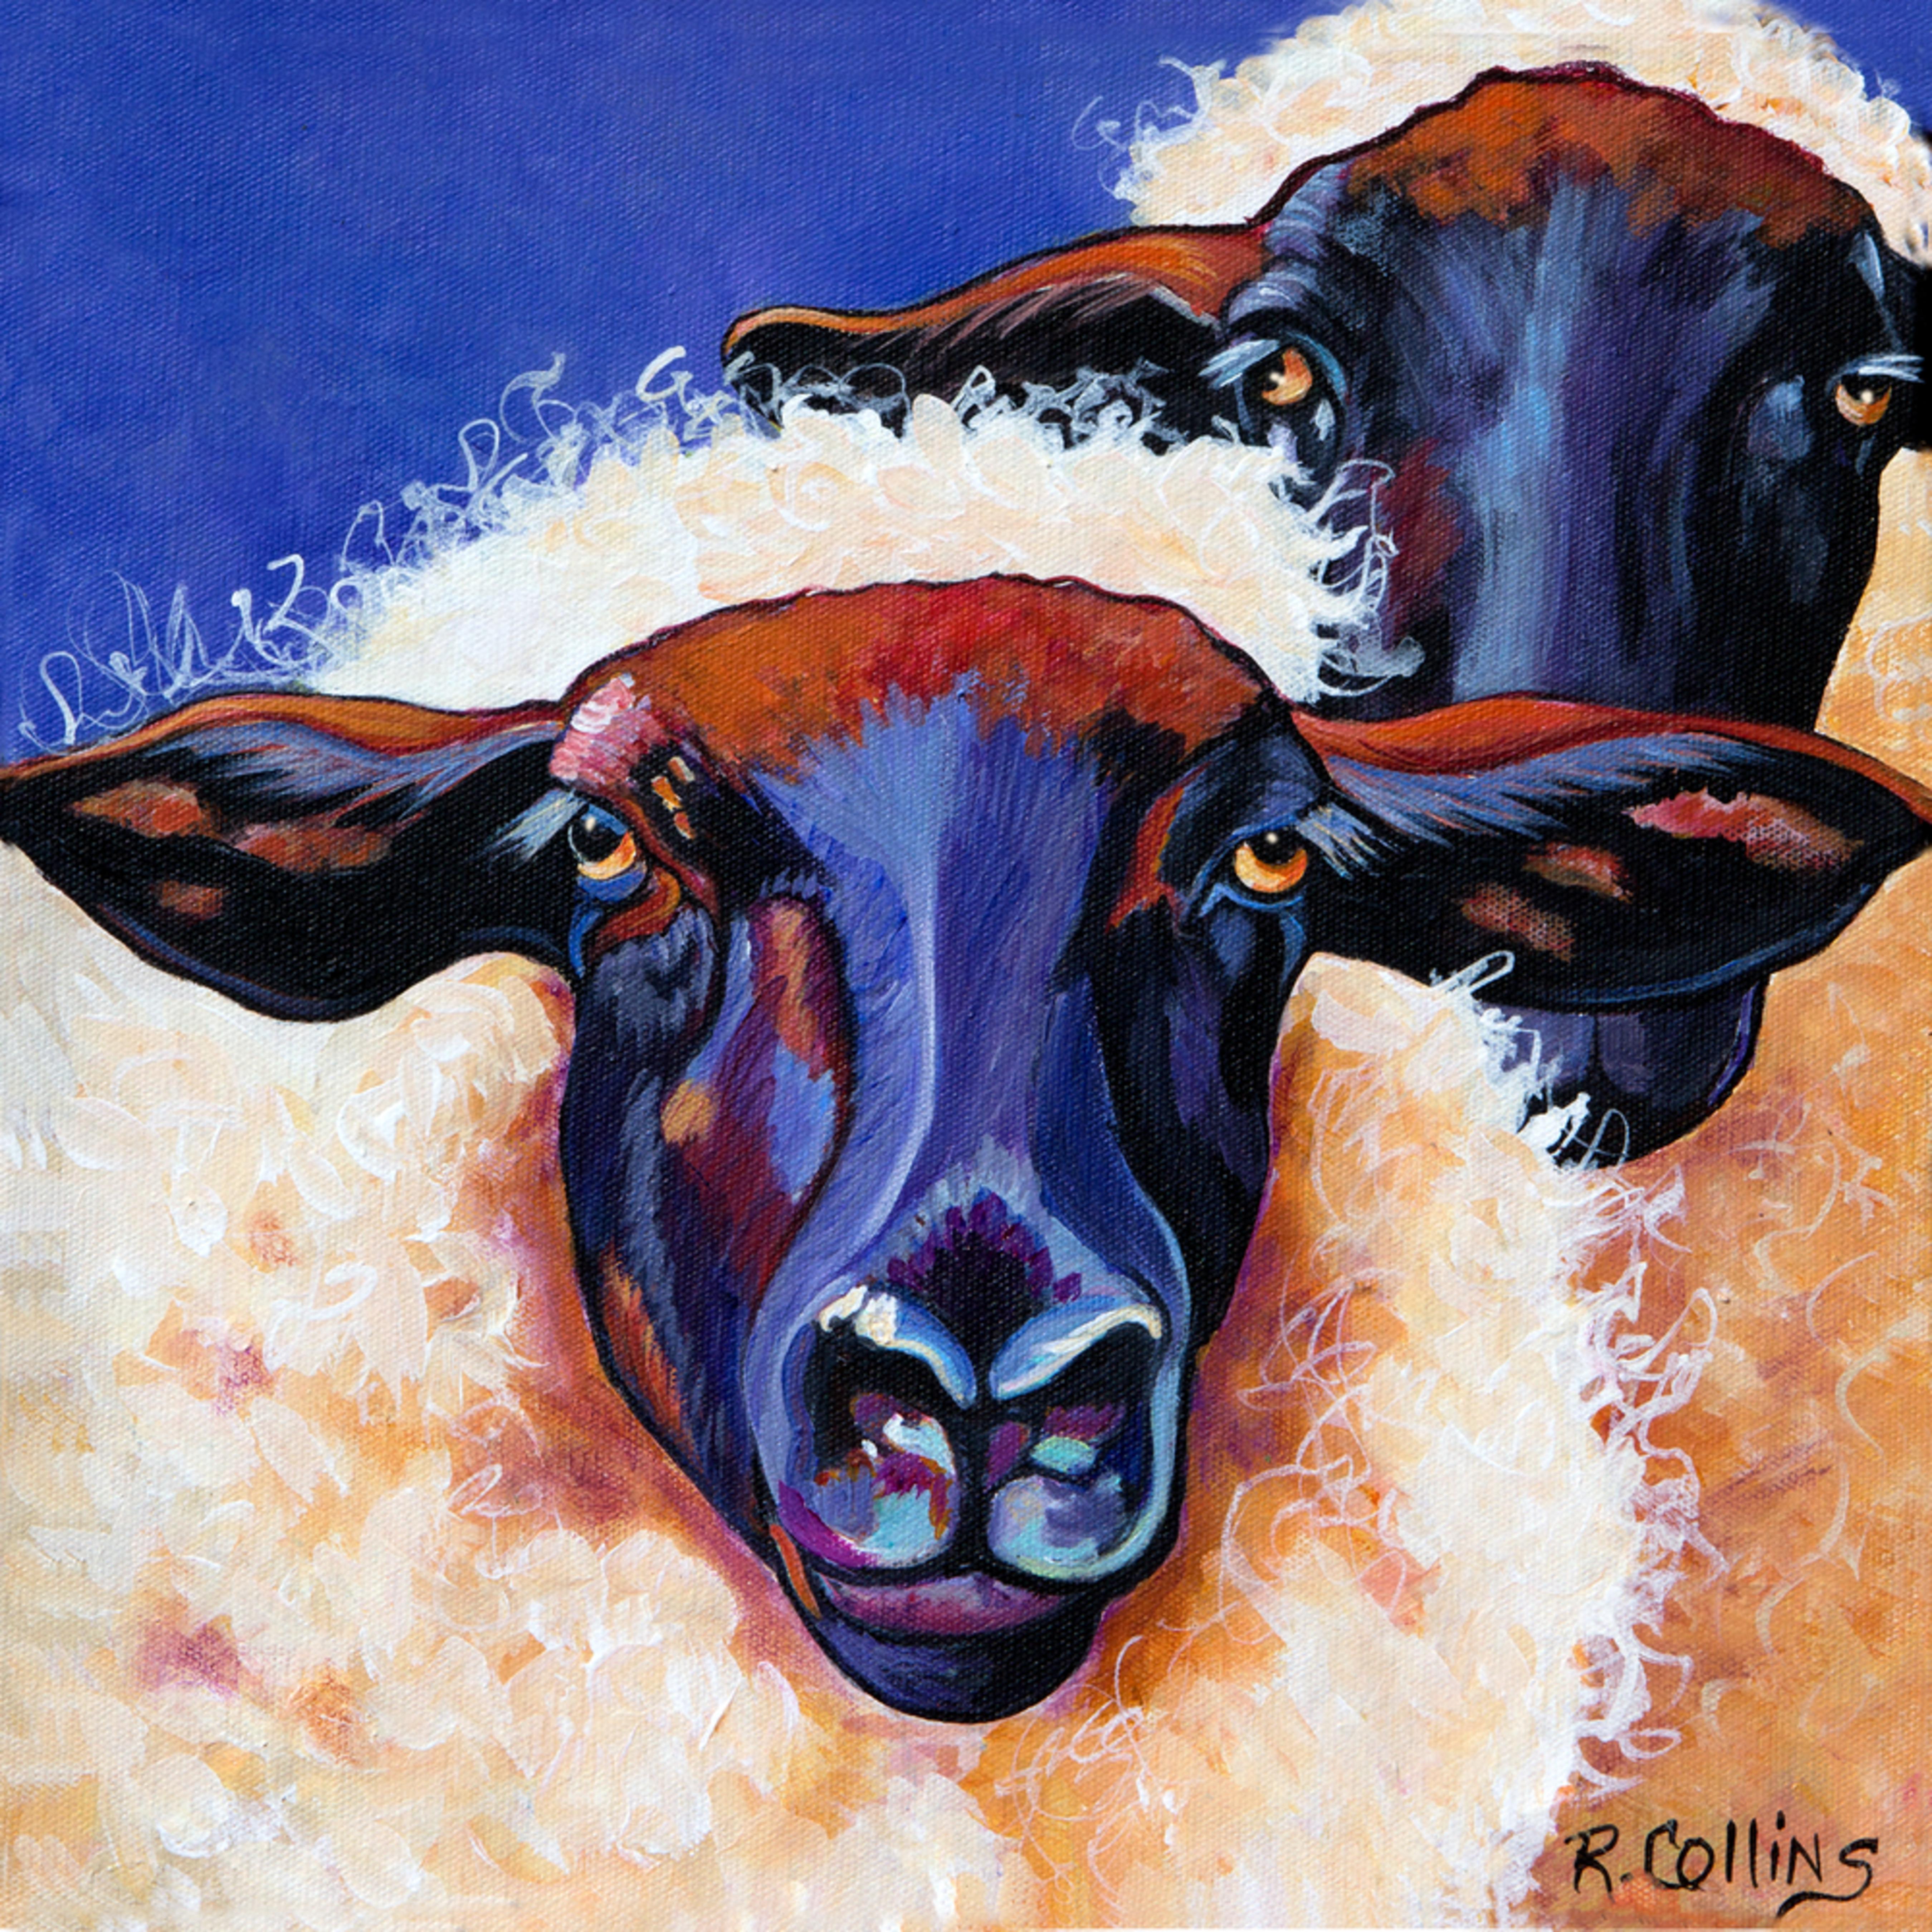 Ba ba blacl sheep vydua9